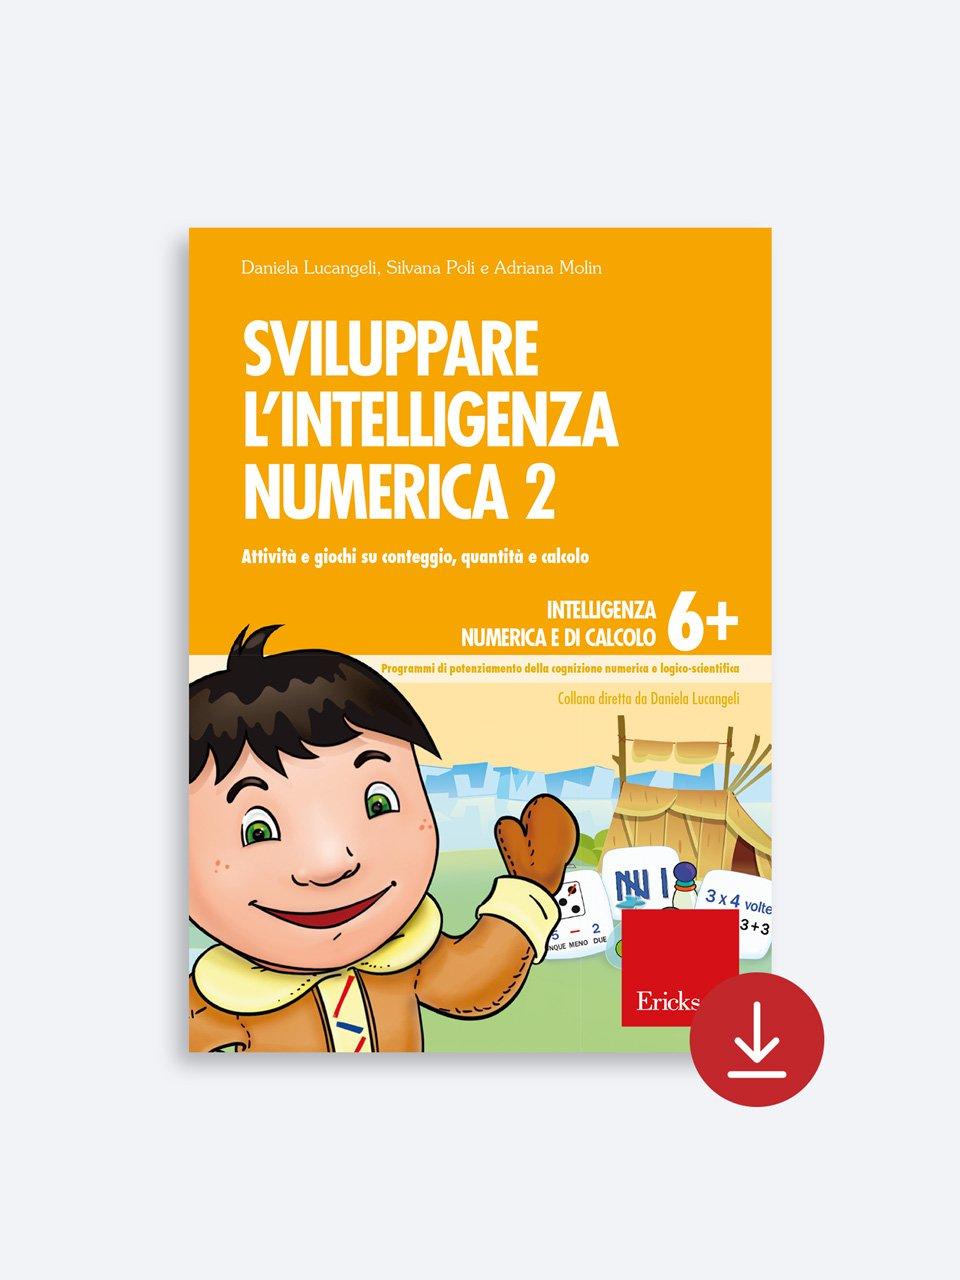 Sviluppare l'intelligenza numerica 2 - Daniela Lucangeli - Erickson 2